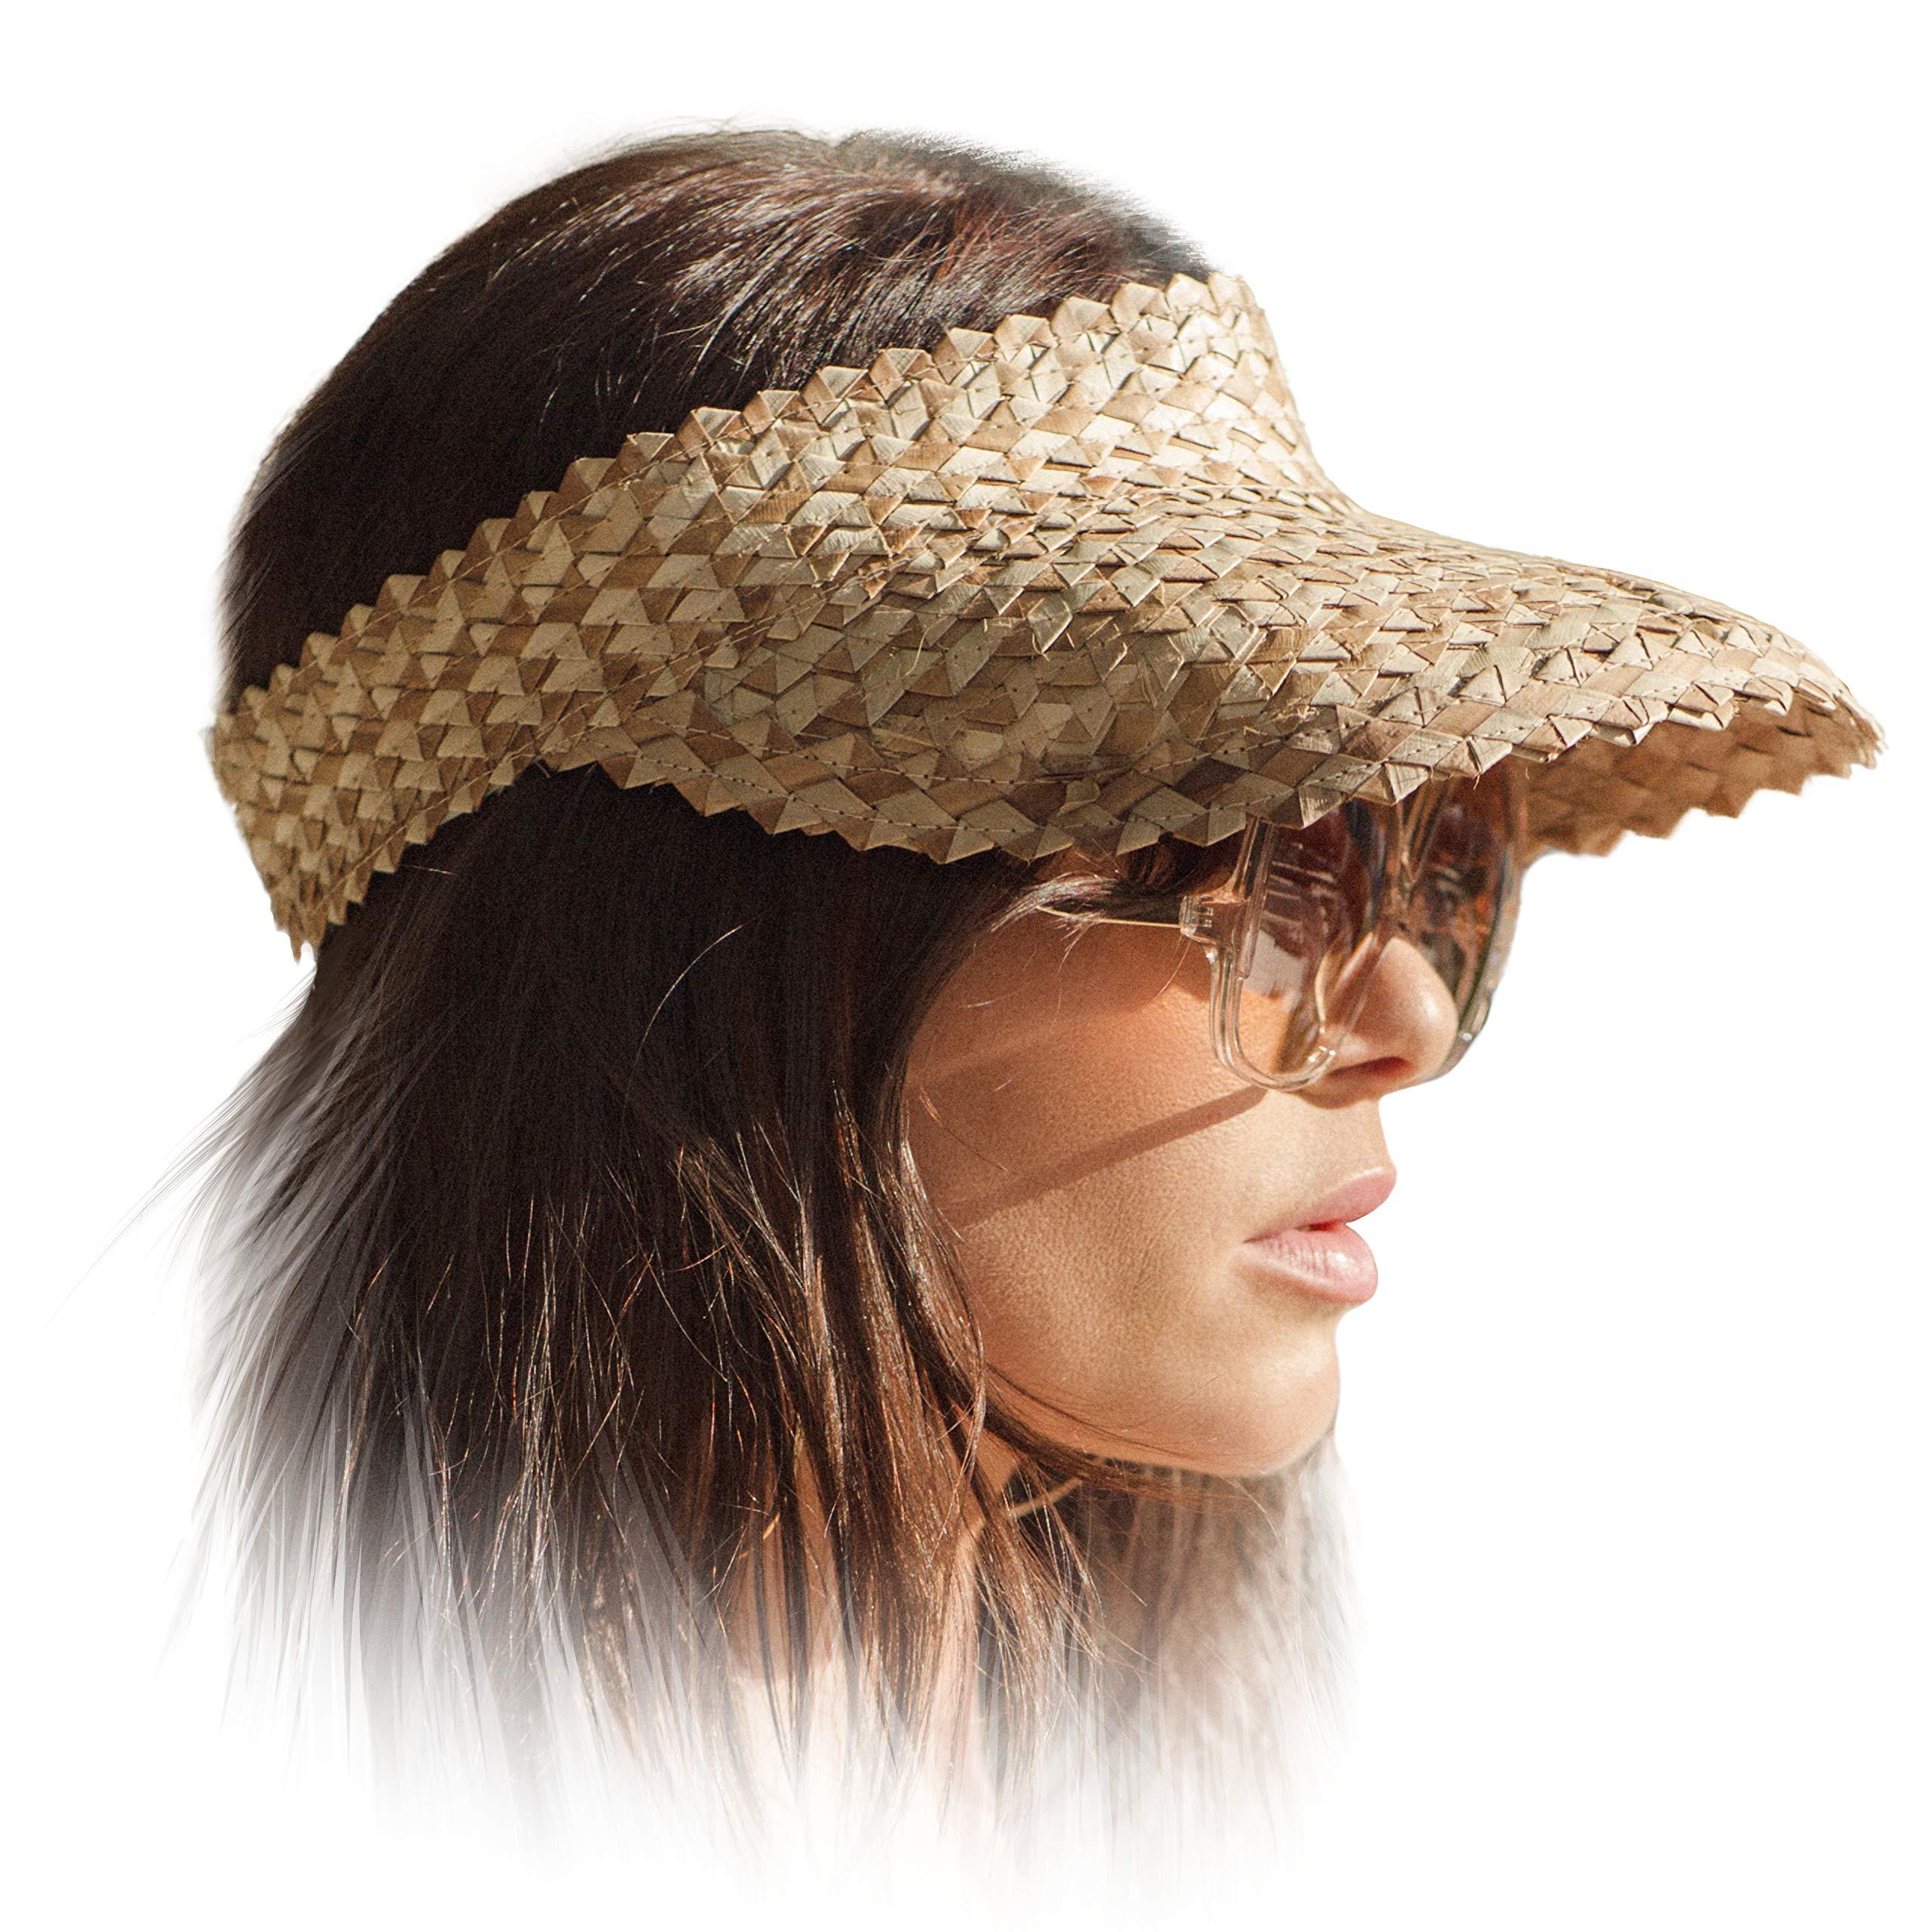 One Natural Billabong Womens Sun Block Visor